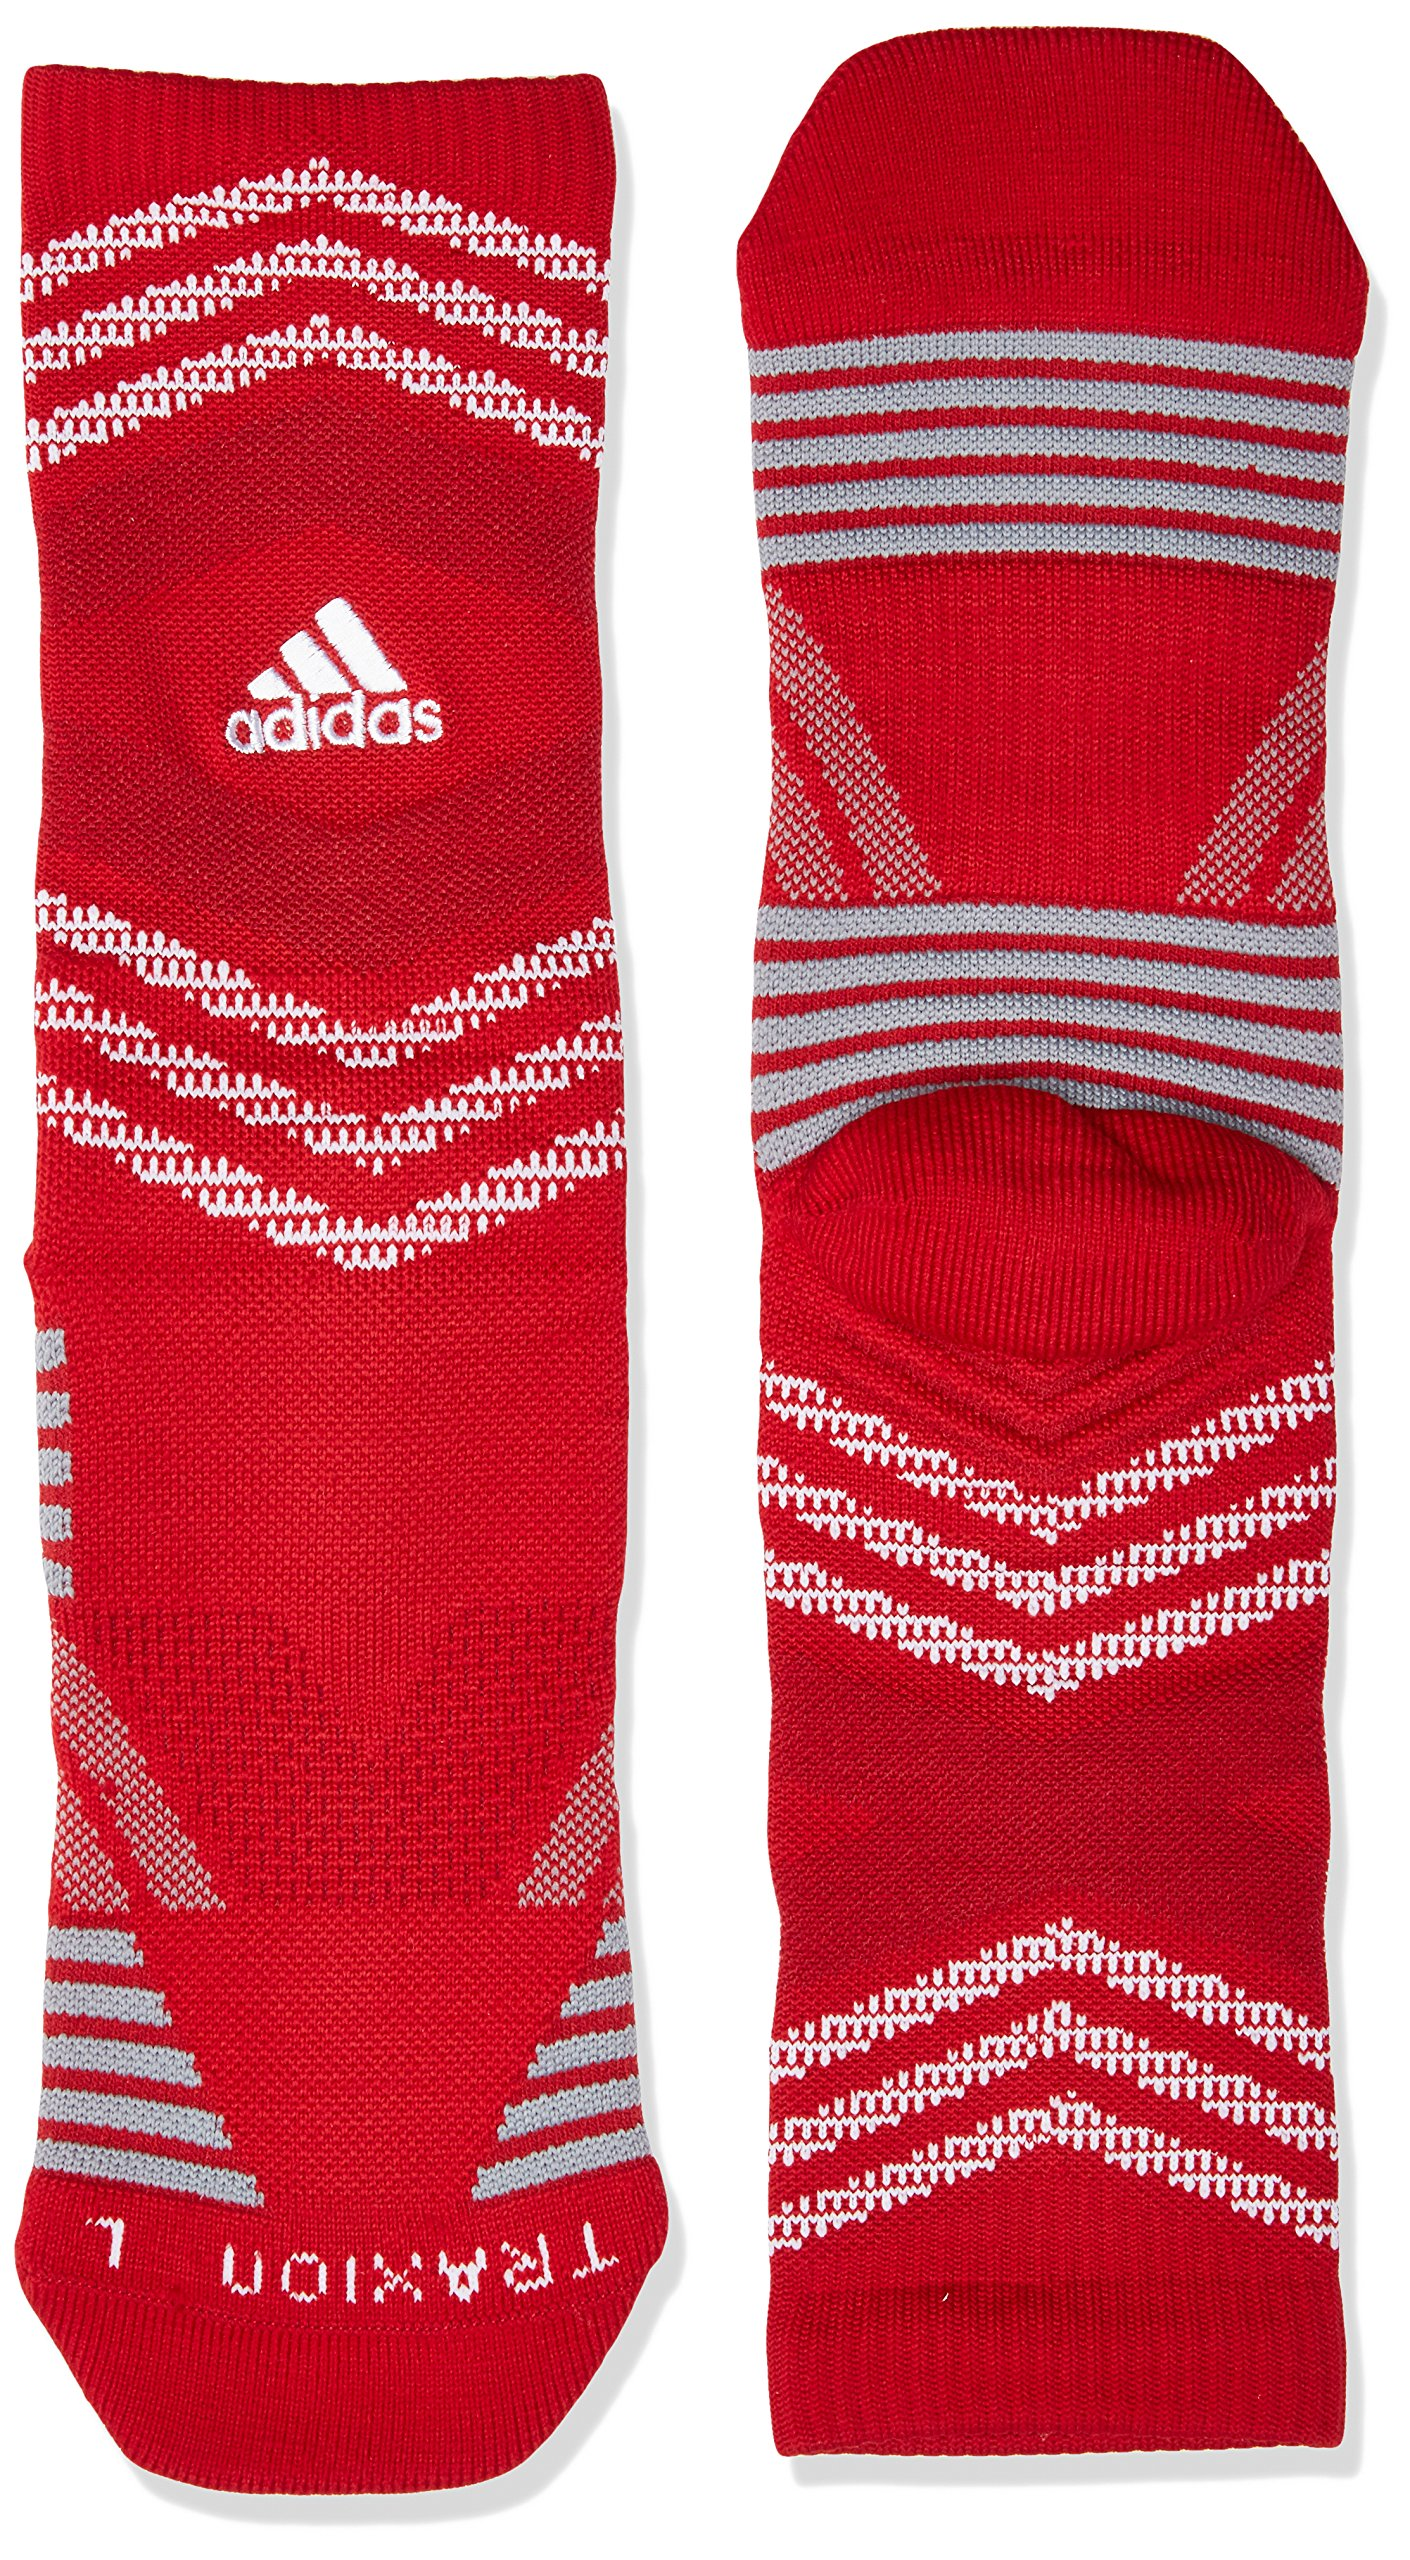 adidas Unisex Speed Mesh Basketball/Football Team Crew Sock